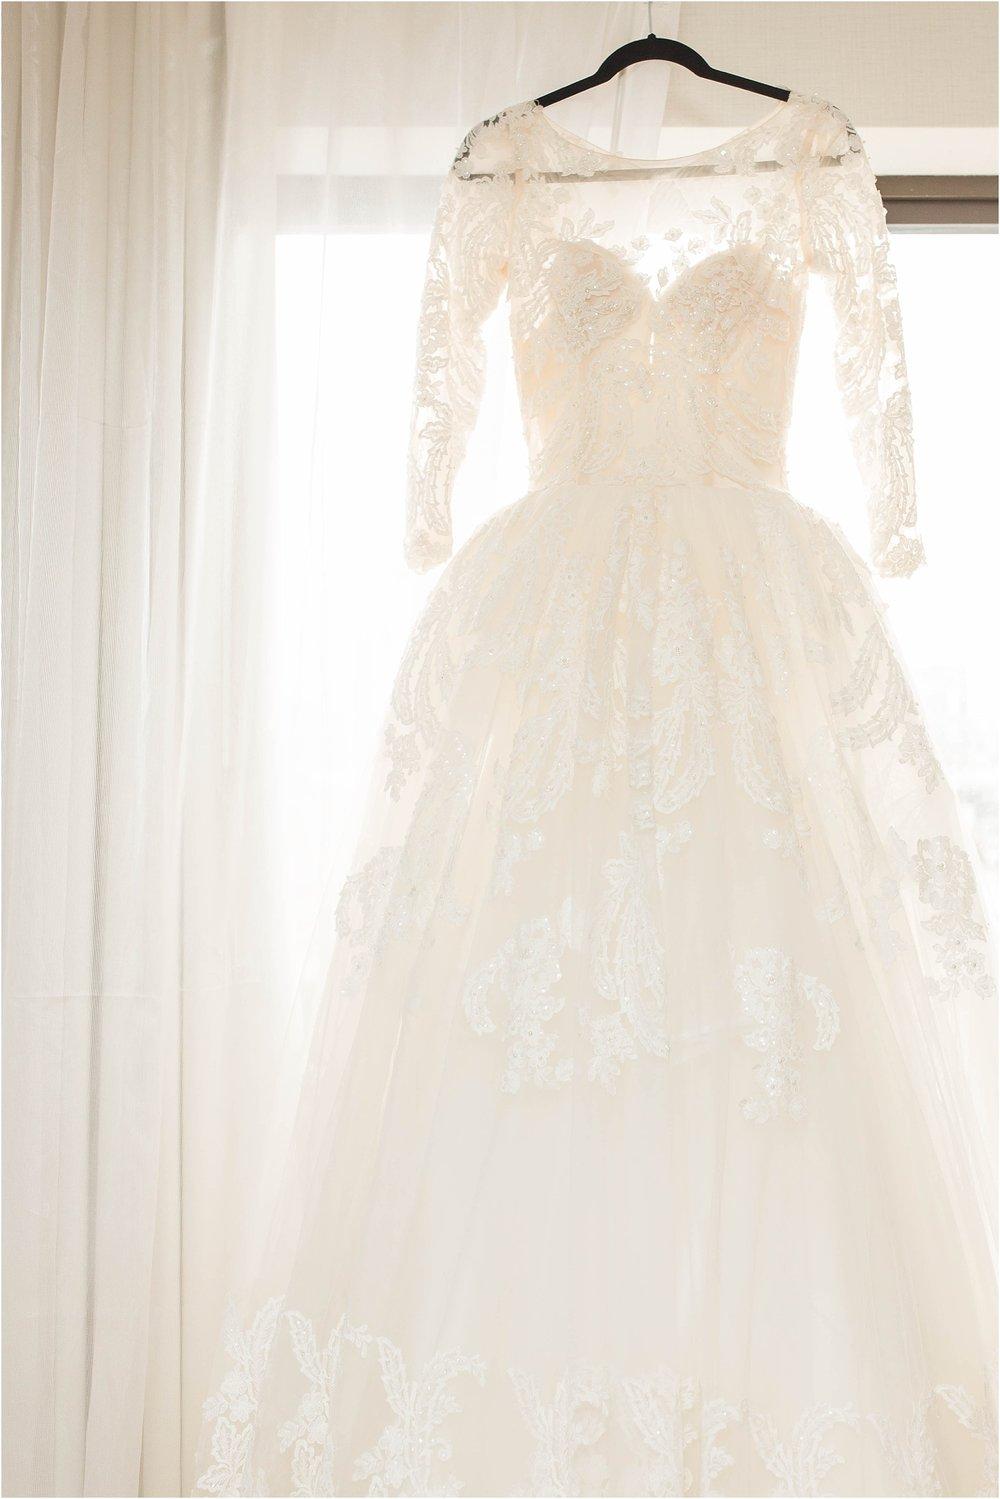 Red-Rose-Convention-Mint-Room-Wedding-Toronto-Mississauga-Brampton-Scarborough-GTA-Pakistani-Indian-Wedding-Engagement-Photographer-Photography_0081.jpg